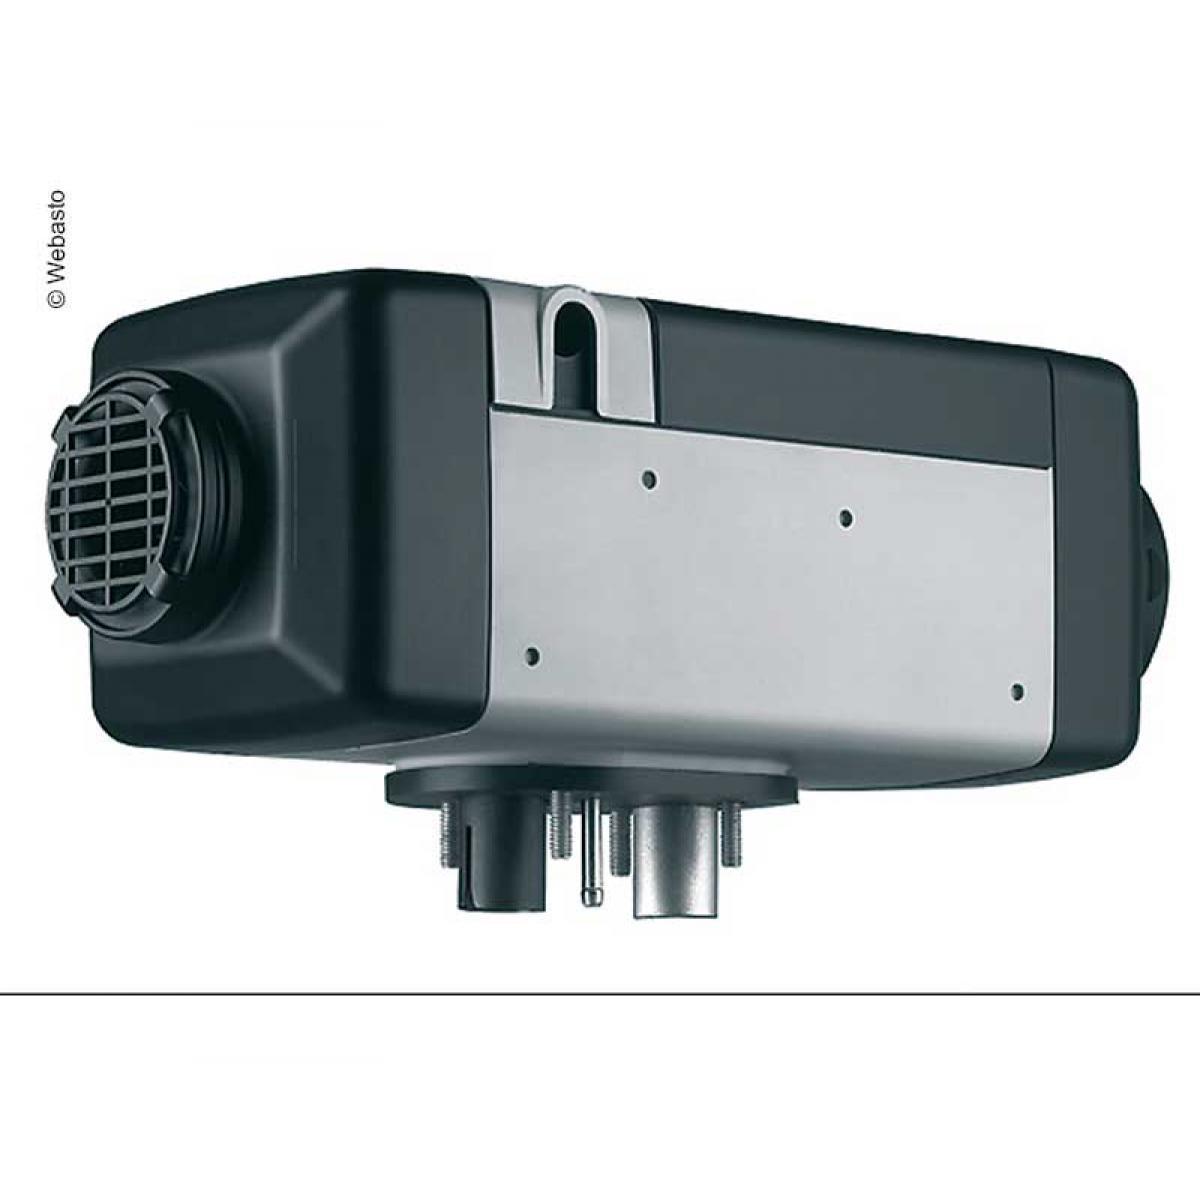 Webasto Air Top 2000STC-D Basis Diesel Standheizung 12V